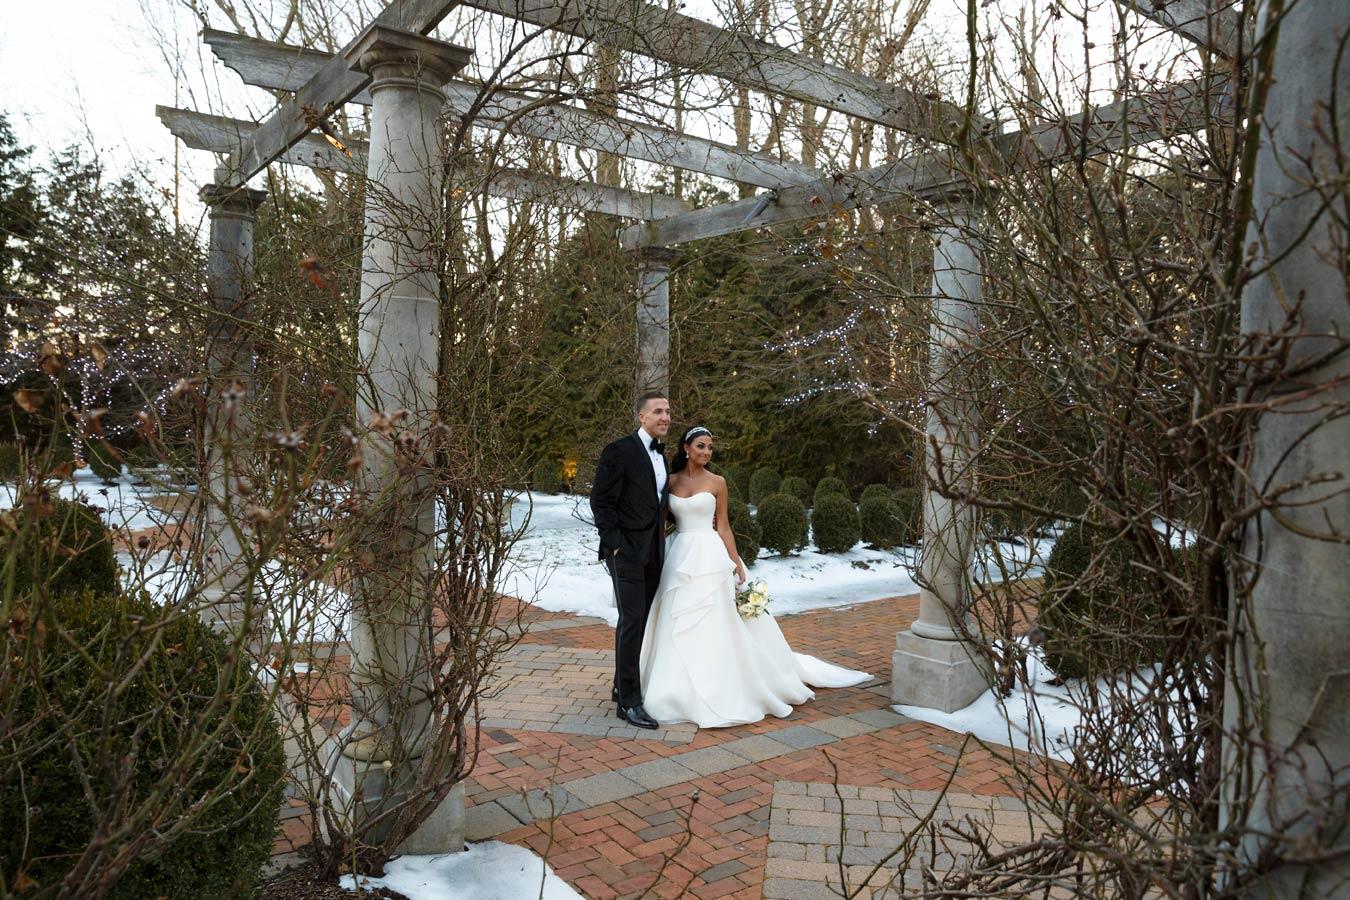 florentine-gardens-wedding-photographer-new-jersey0104.jpg